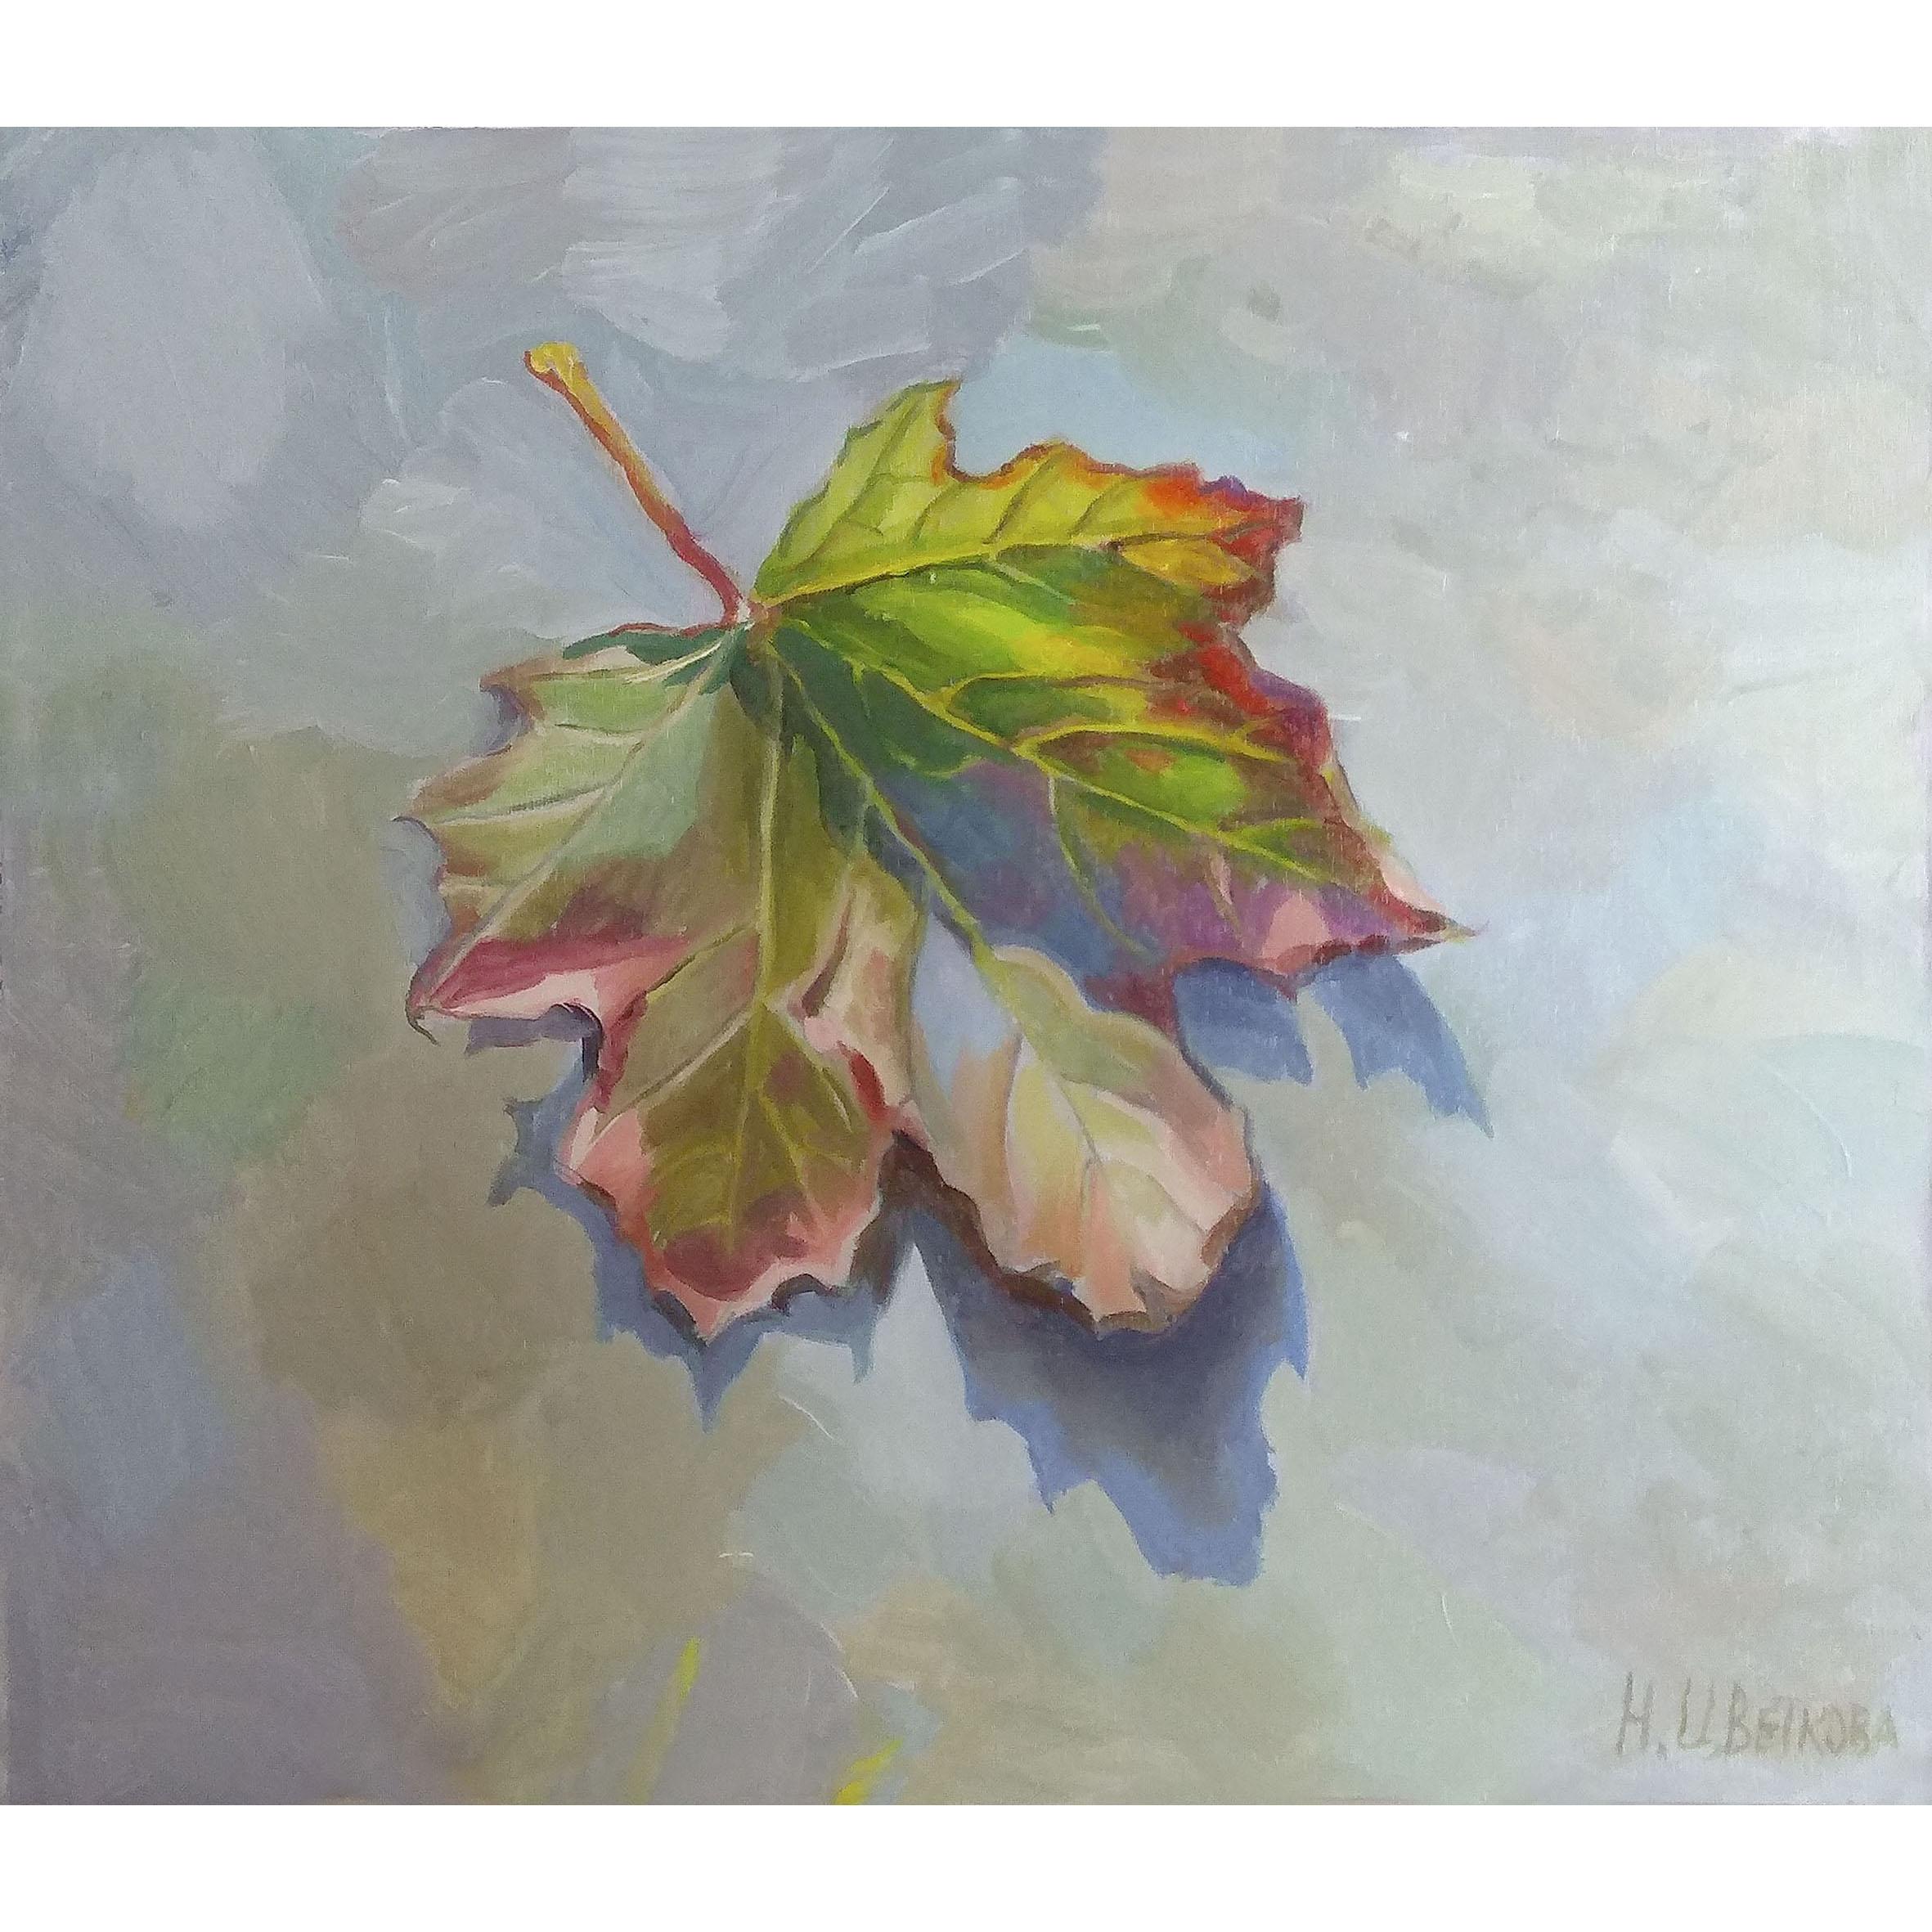 Cухое солнце - осенний лист